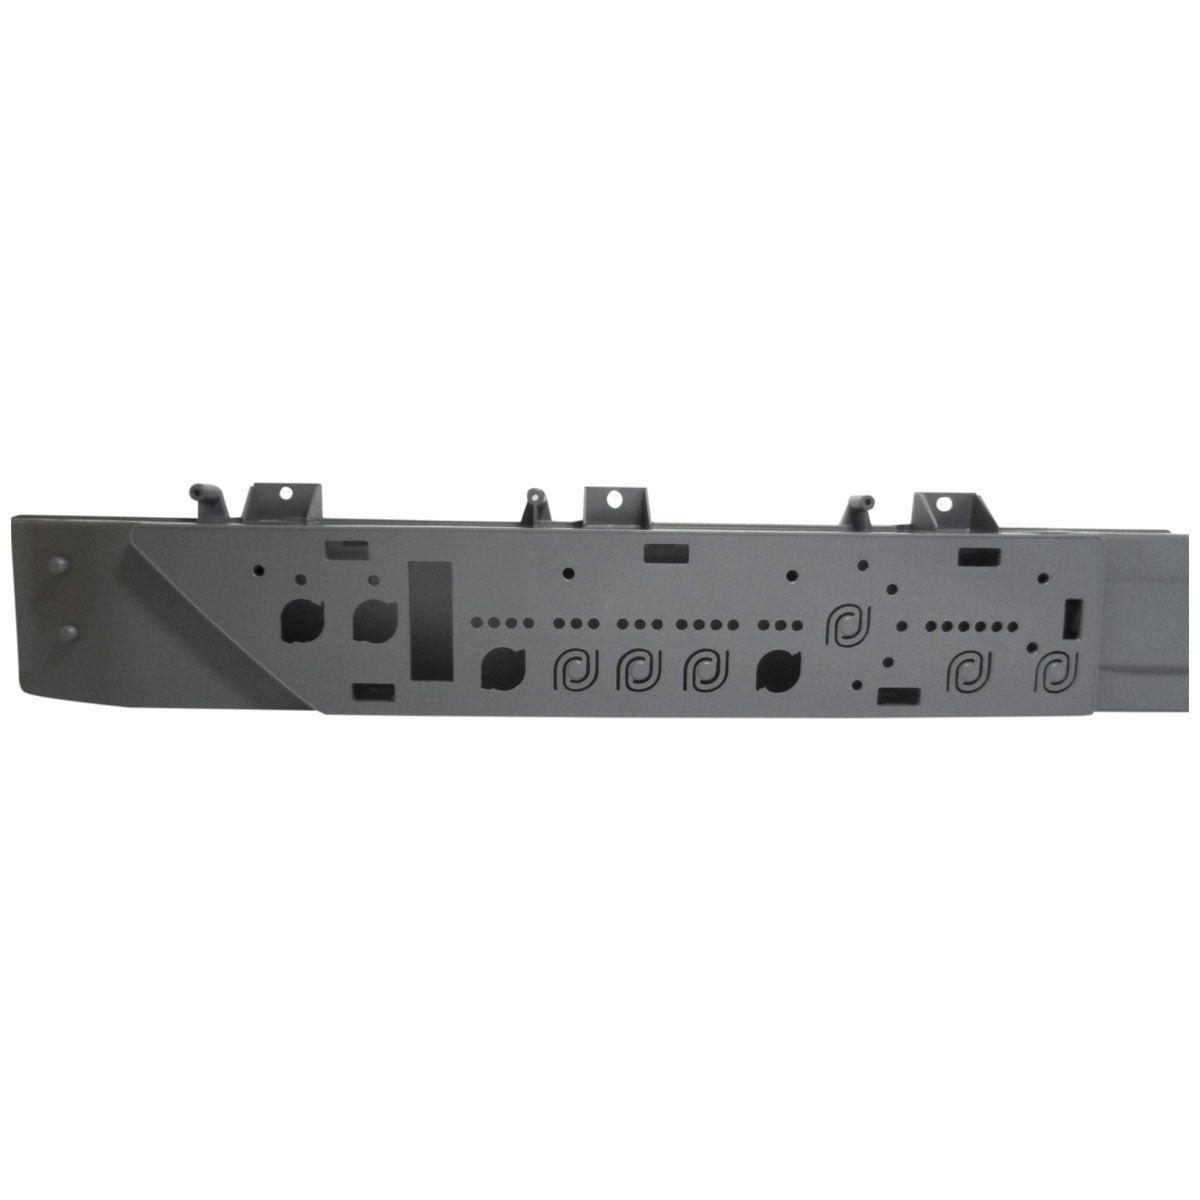 Suporte Placa Interface Lavadora Brastemp 326054047